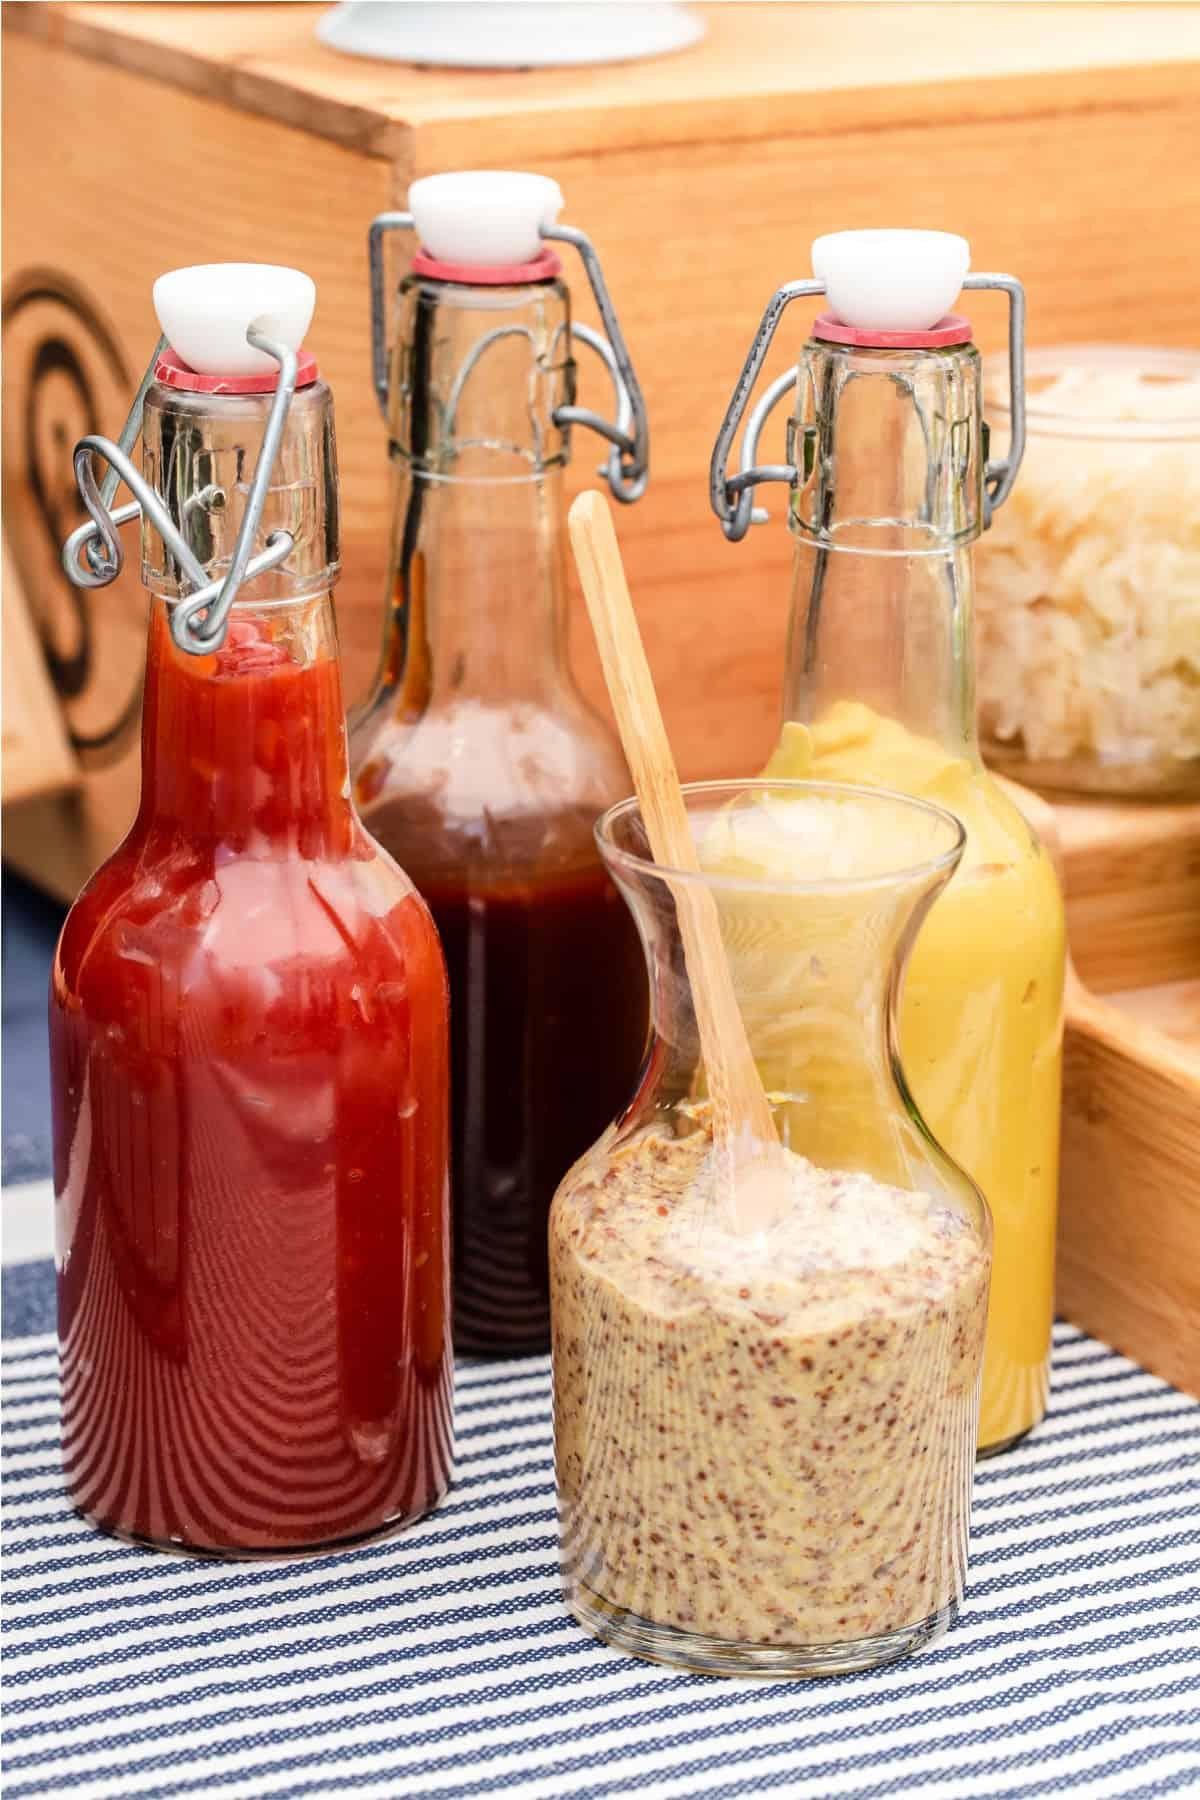 condiments in bottles